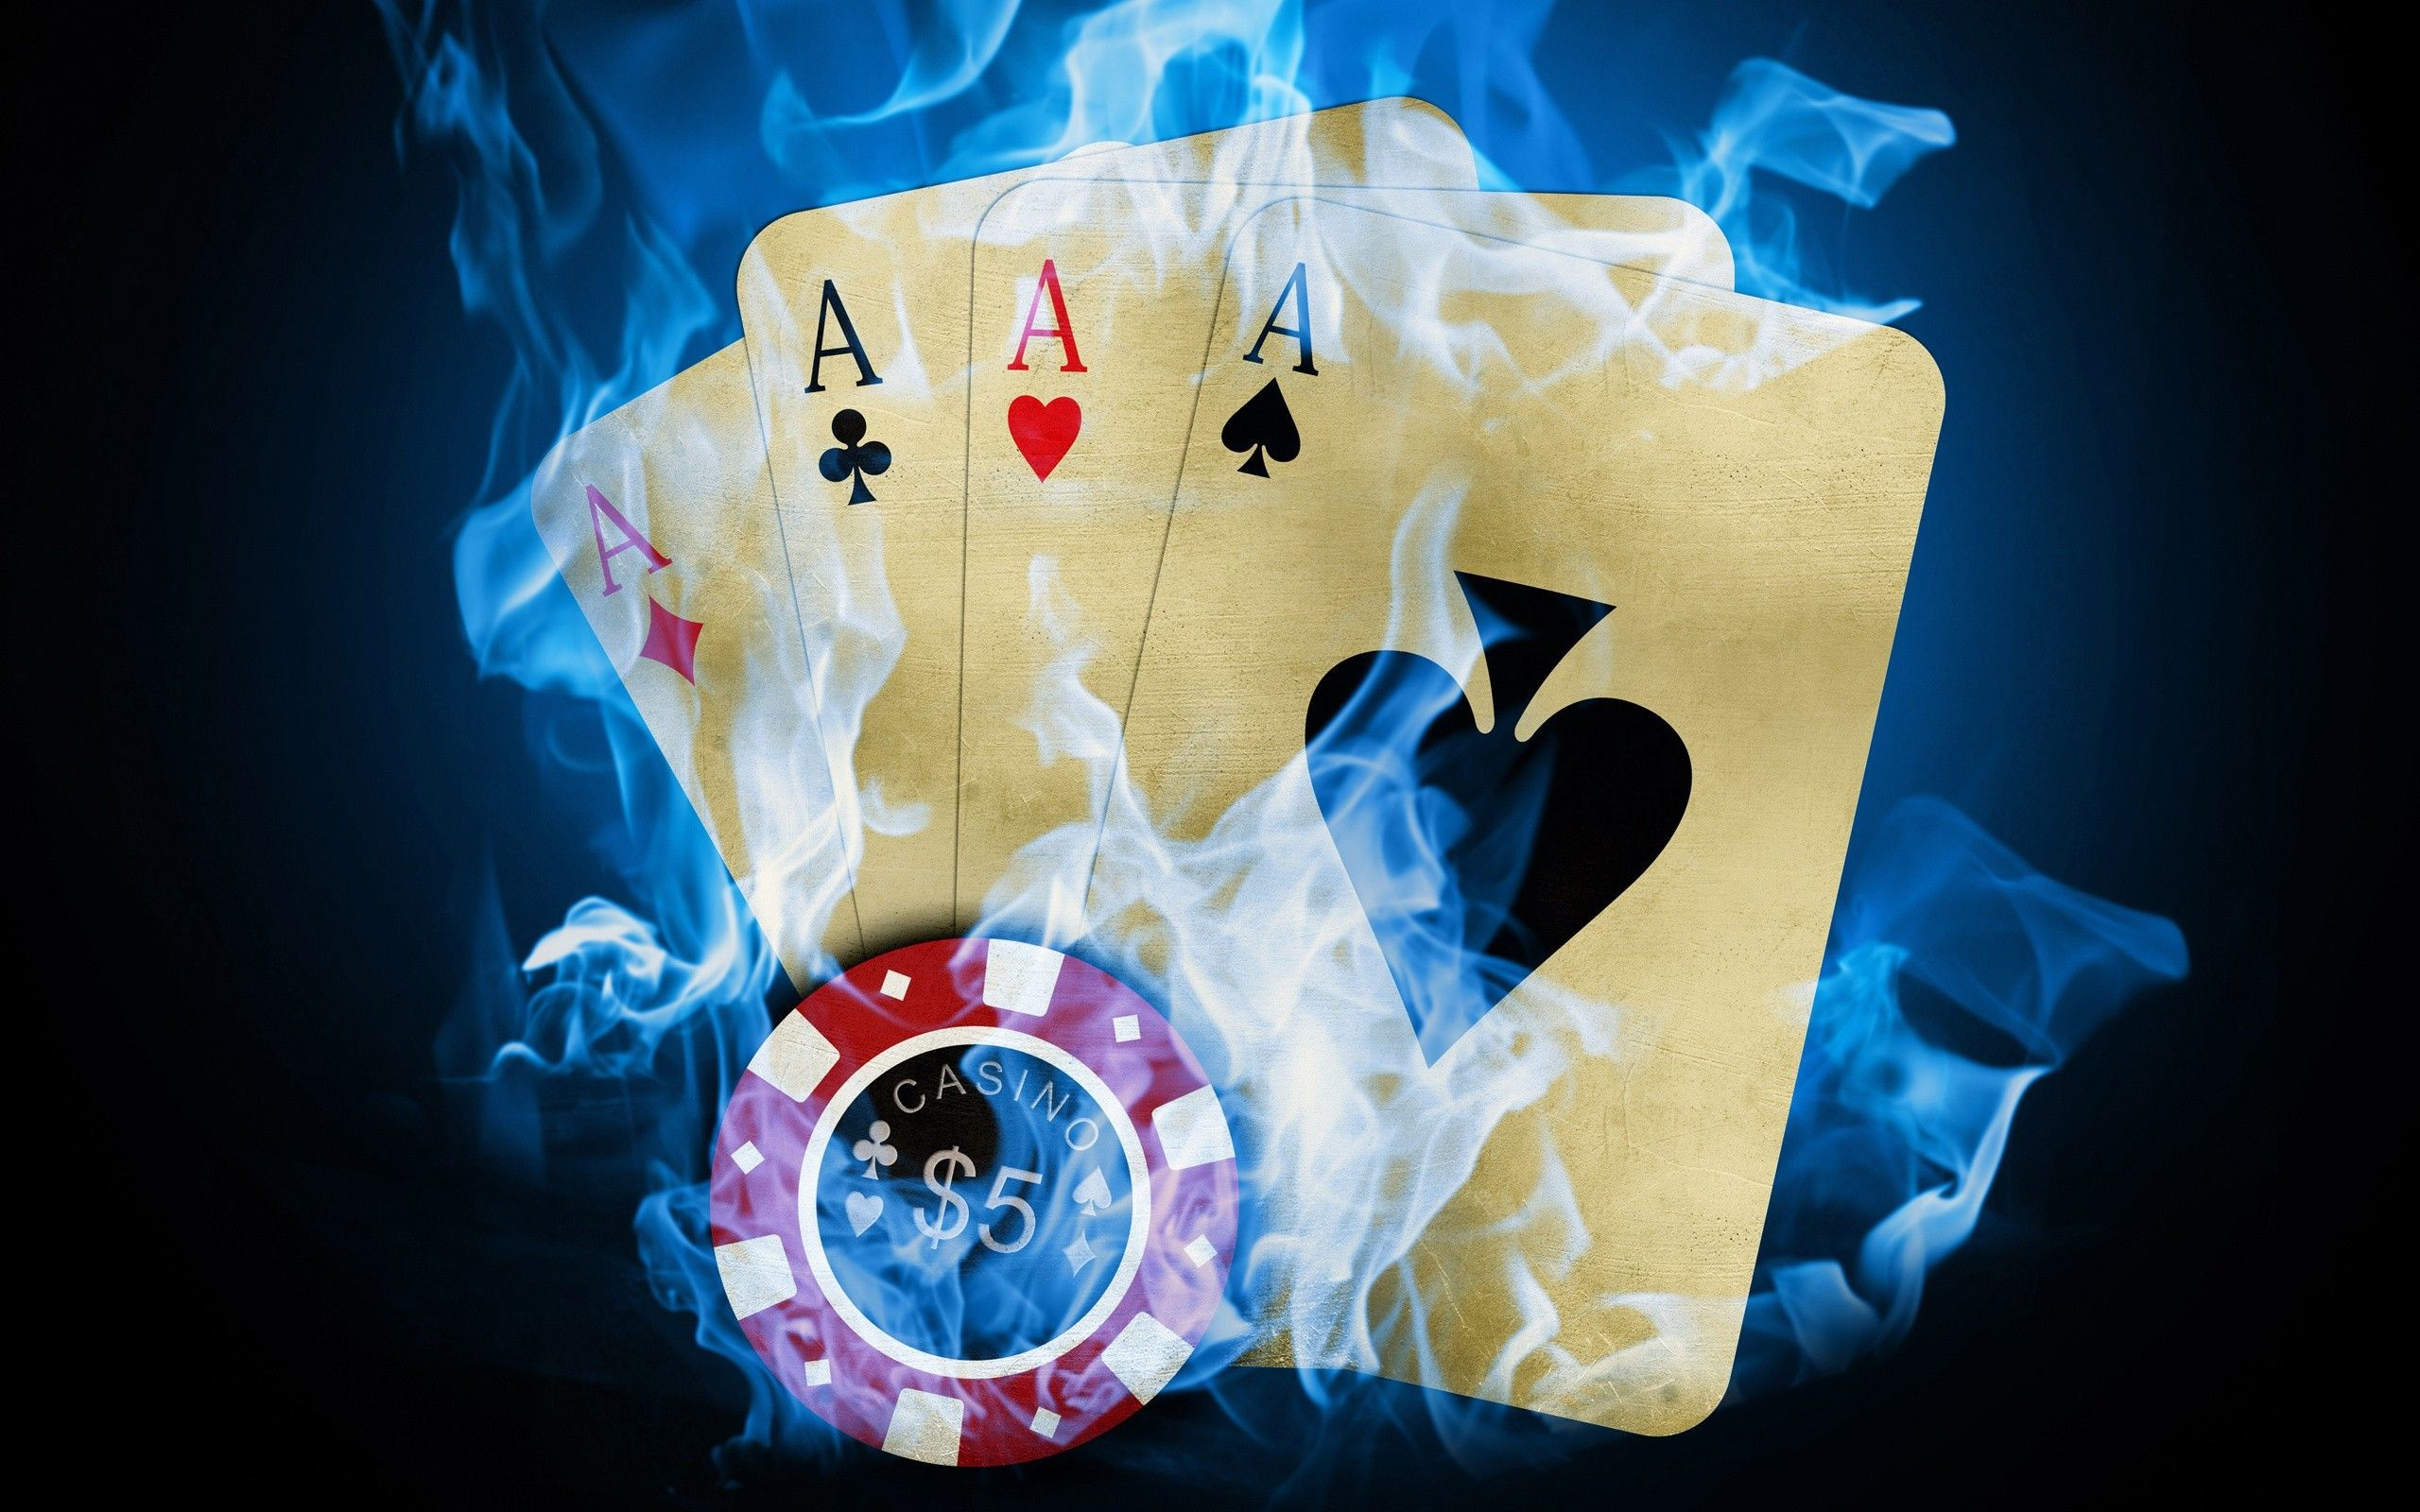 cards, flames, blue, fire, poker, Ace, chip, token :